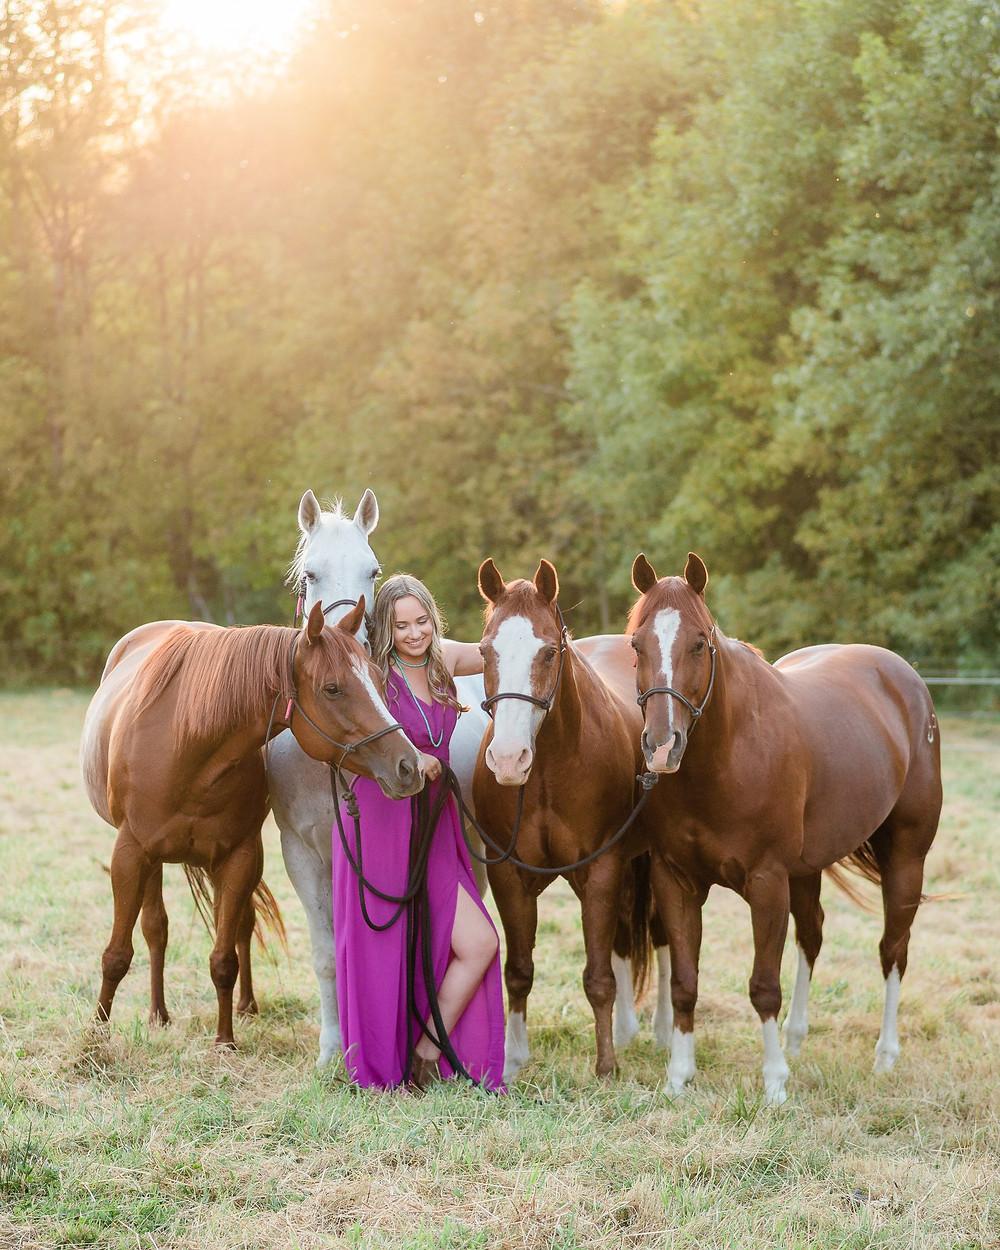 Bailey with all four horses, Mel B, Sugar, Dilbert, and Gordon